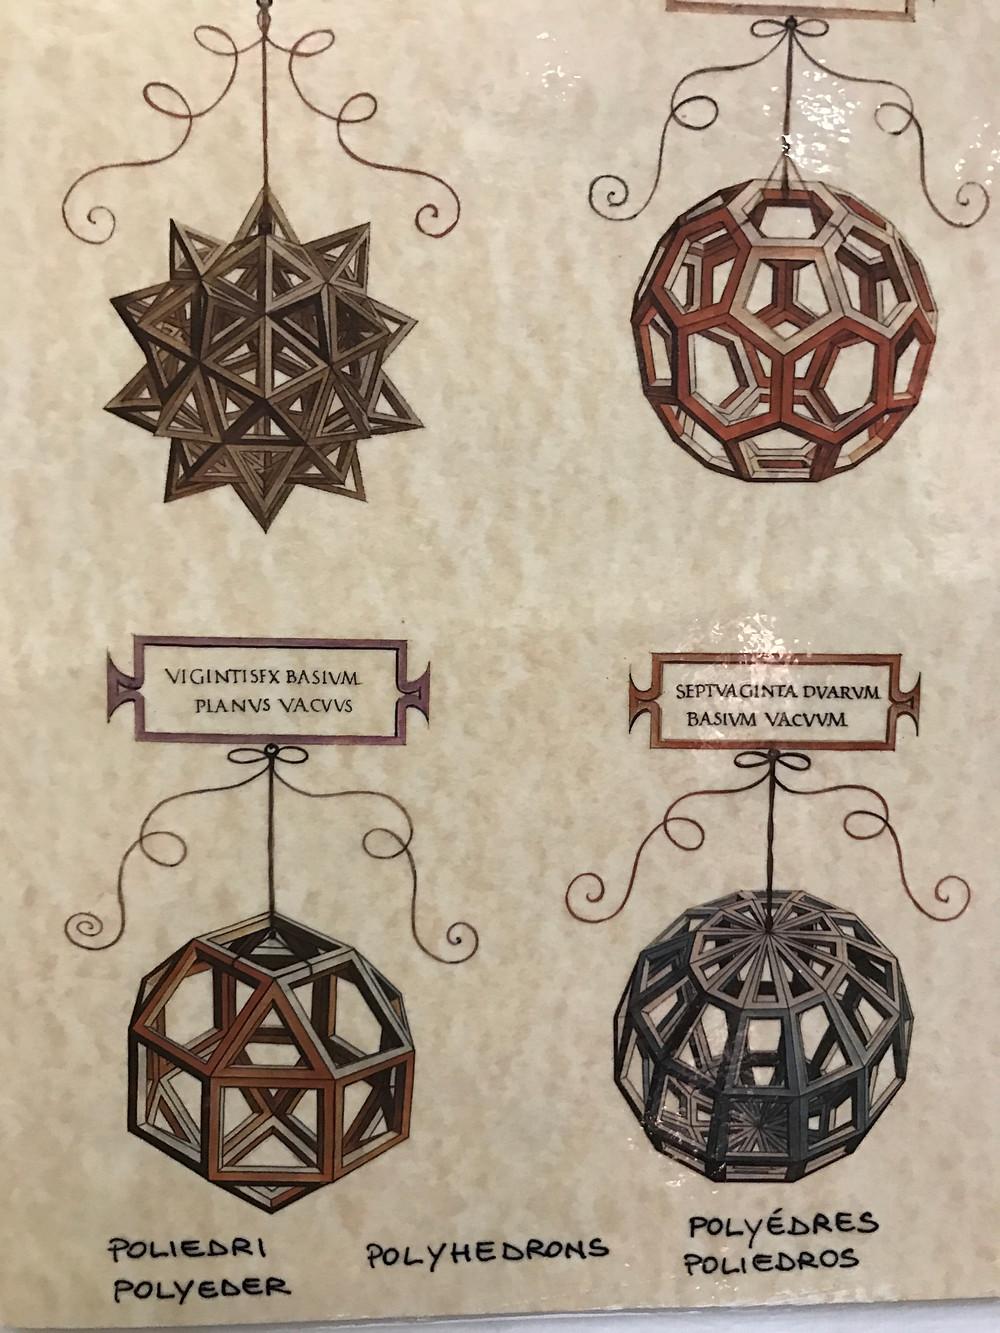 Skeleton polyhedra by Leonardo Da Vinci